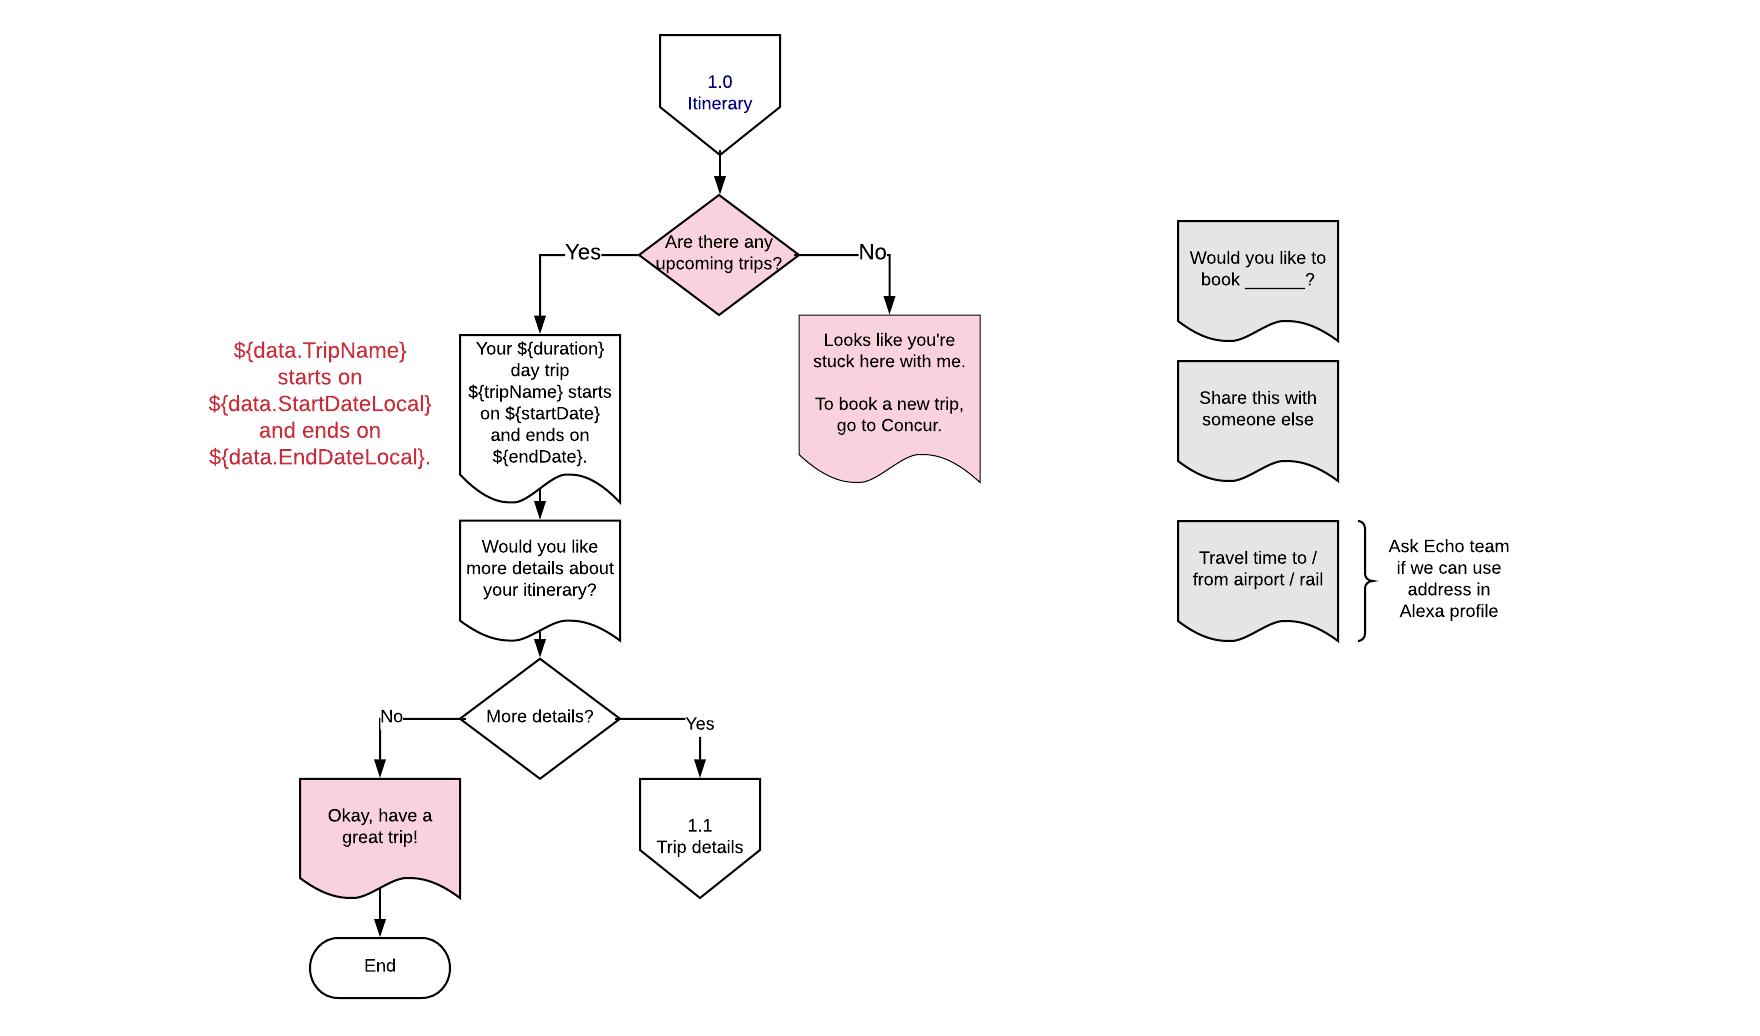 1.0 Trip Summary User Flow